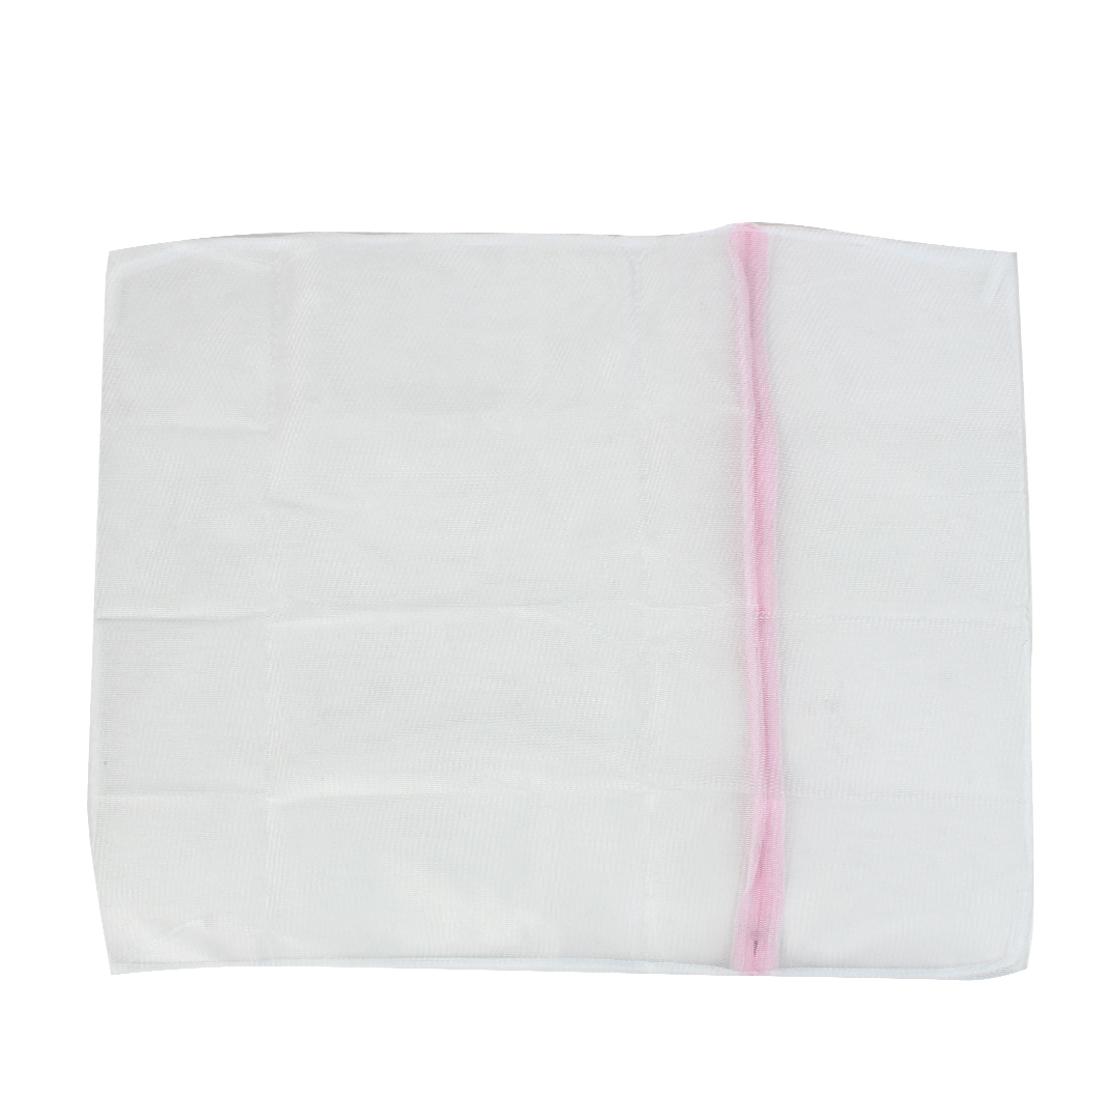 "Zipper White Nylon Mesh Wash Medium Sweaters Cloths Bras Underwear Protector Laundry Net Washing Bag 24"" x 24"""